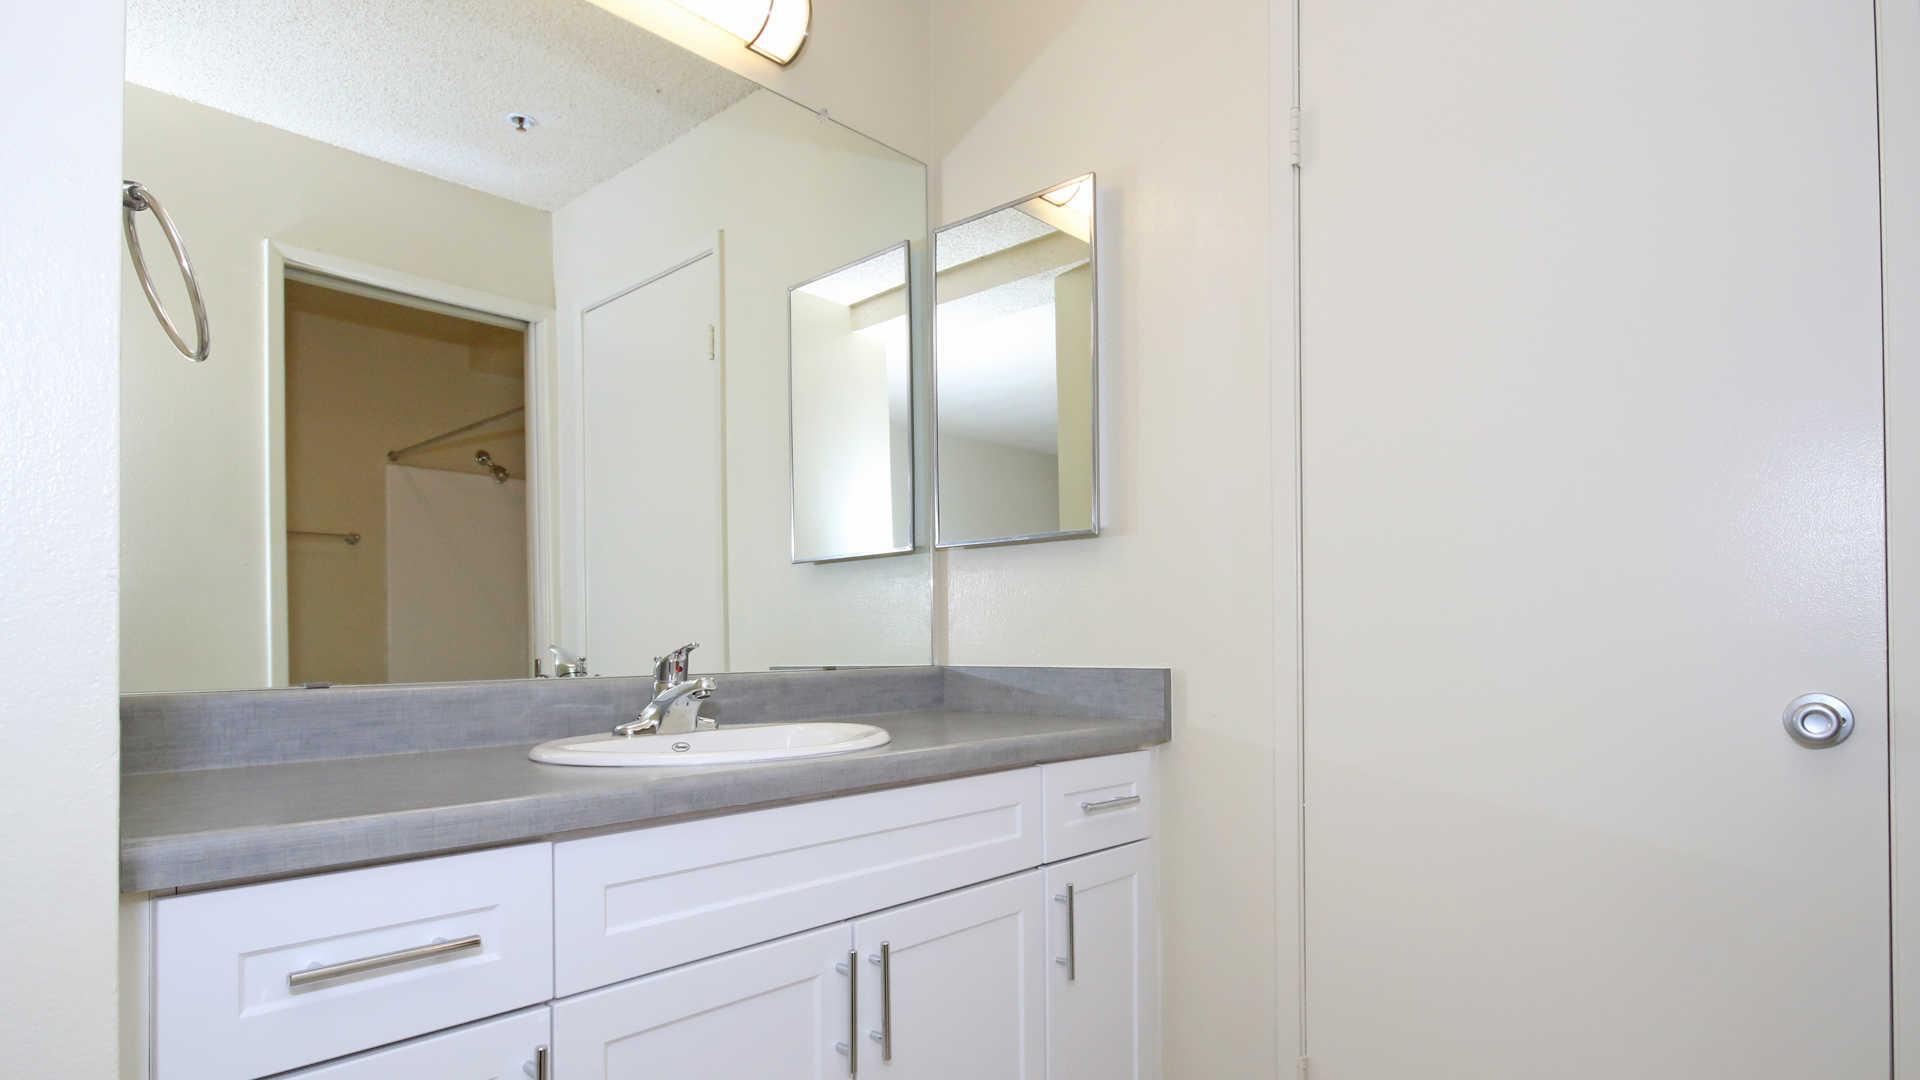 873 Stevens Ave #2311-875, Solana Beach, CA - $2,625 USD/ month